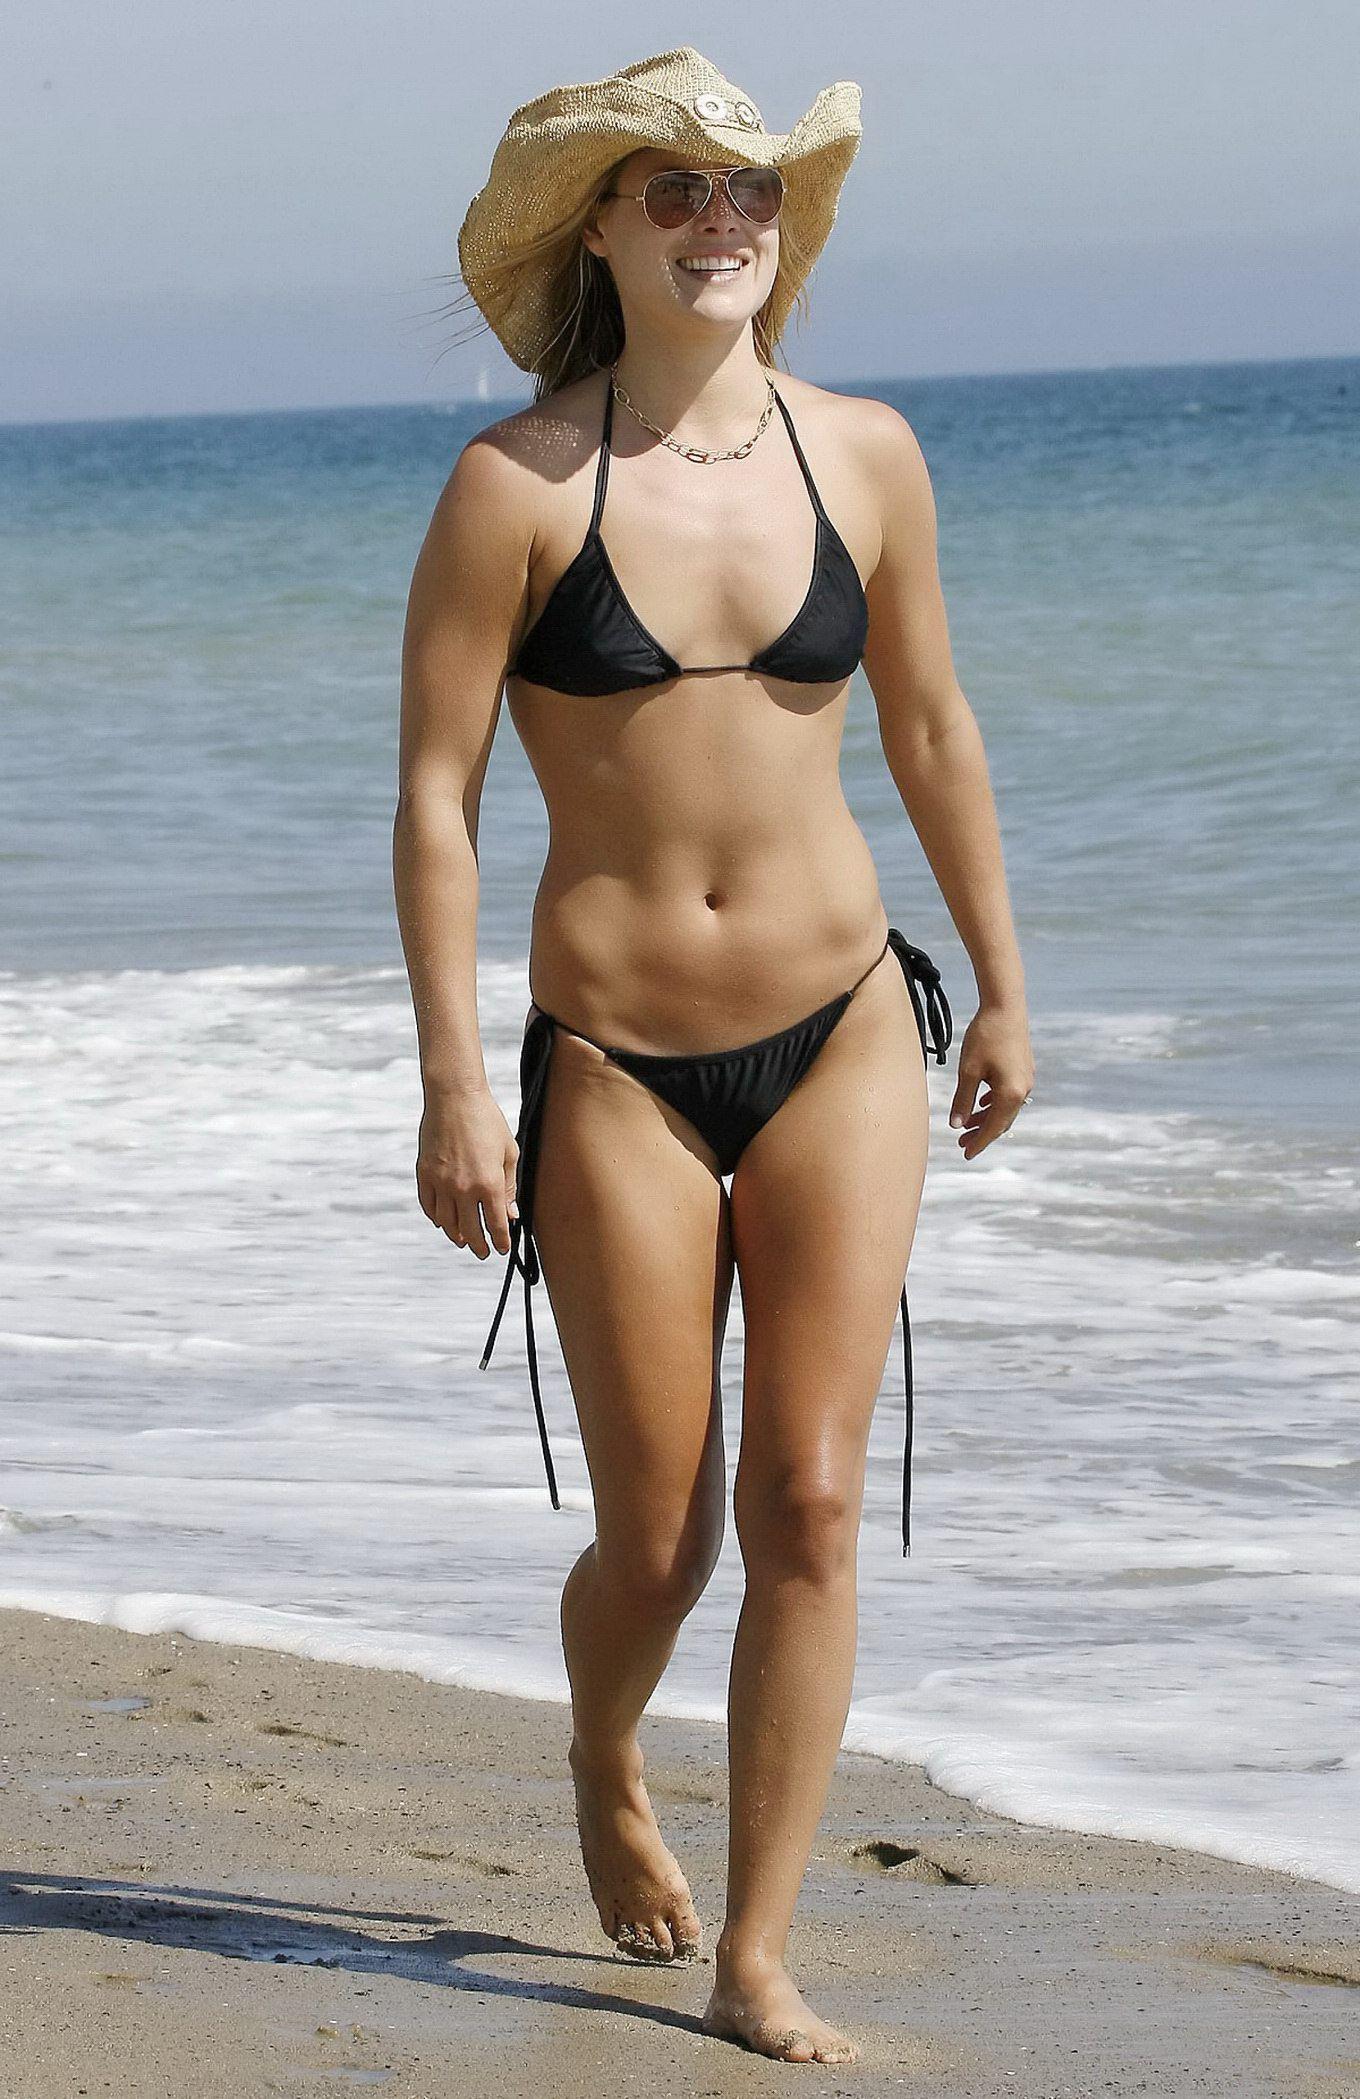 Bikini Sarah Bolger nudes (82 foto and video), Pussy, Hot, Feet, bra 2015